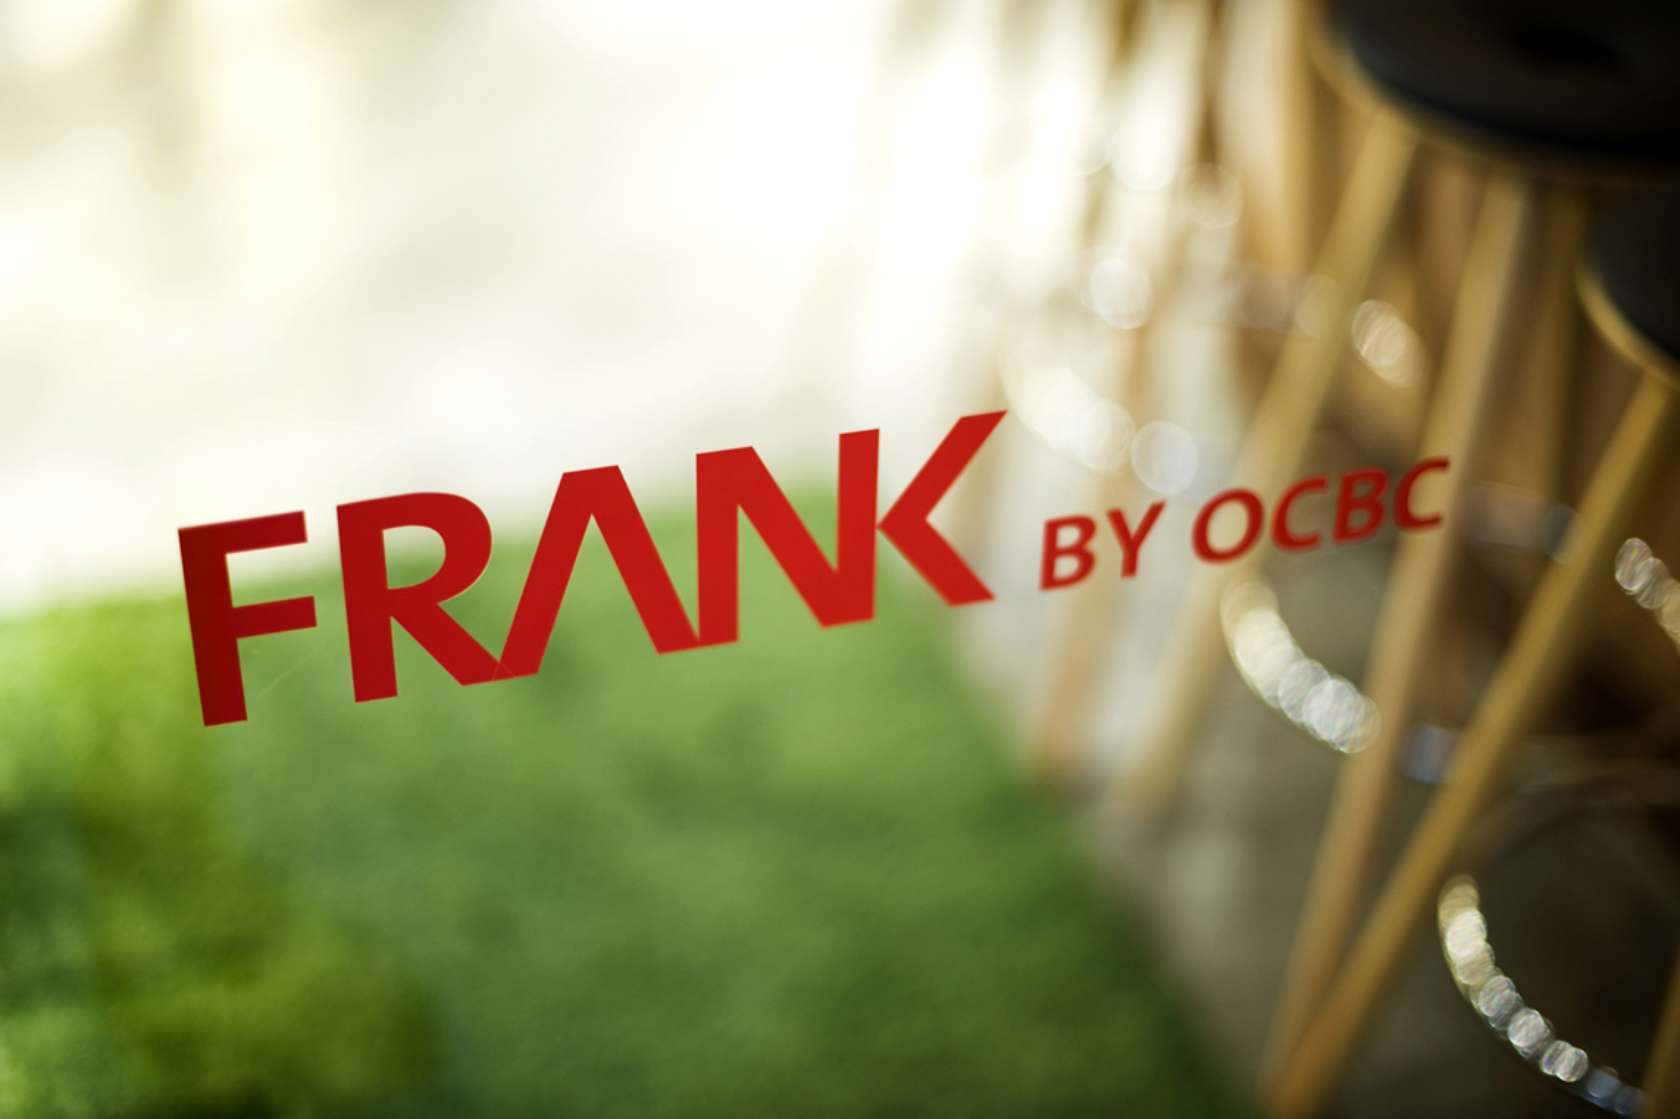 FRANK by OCBC - Architizer